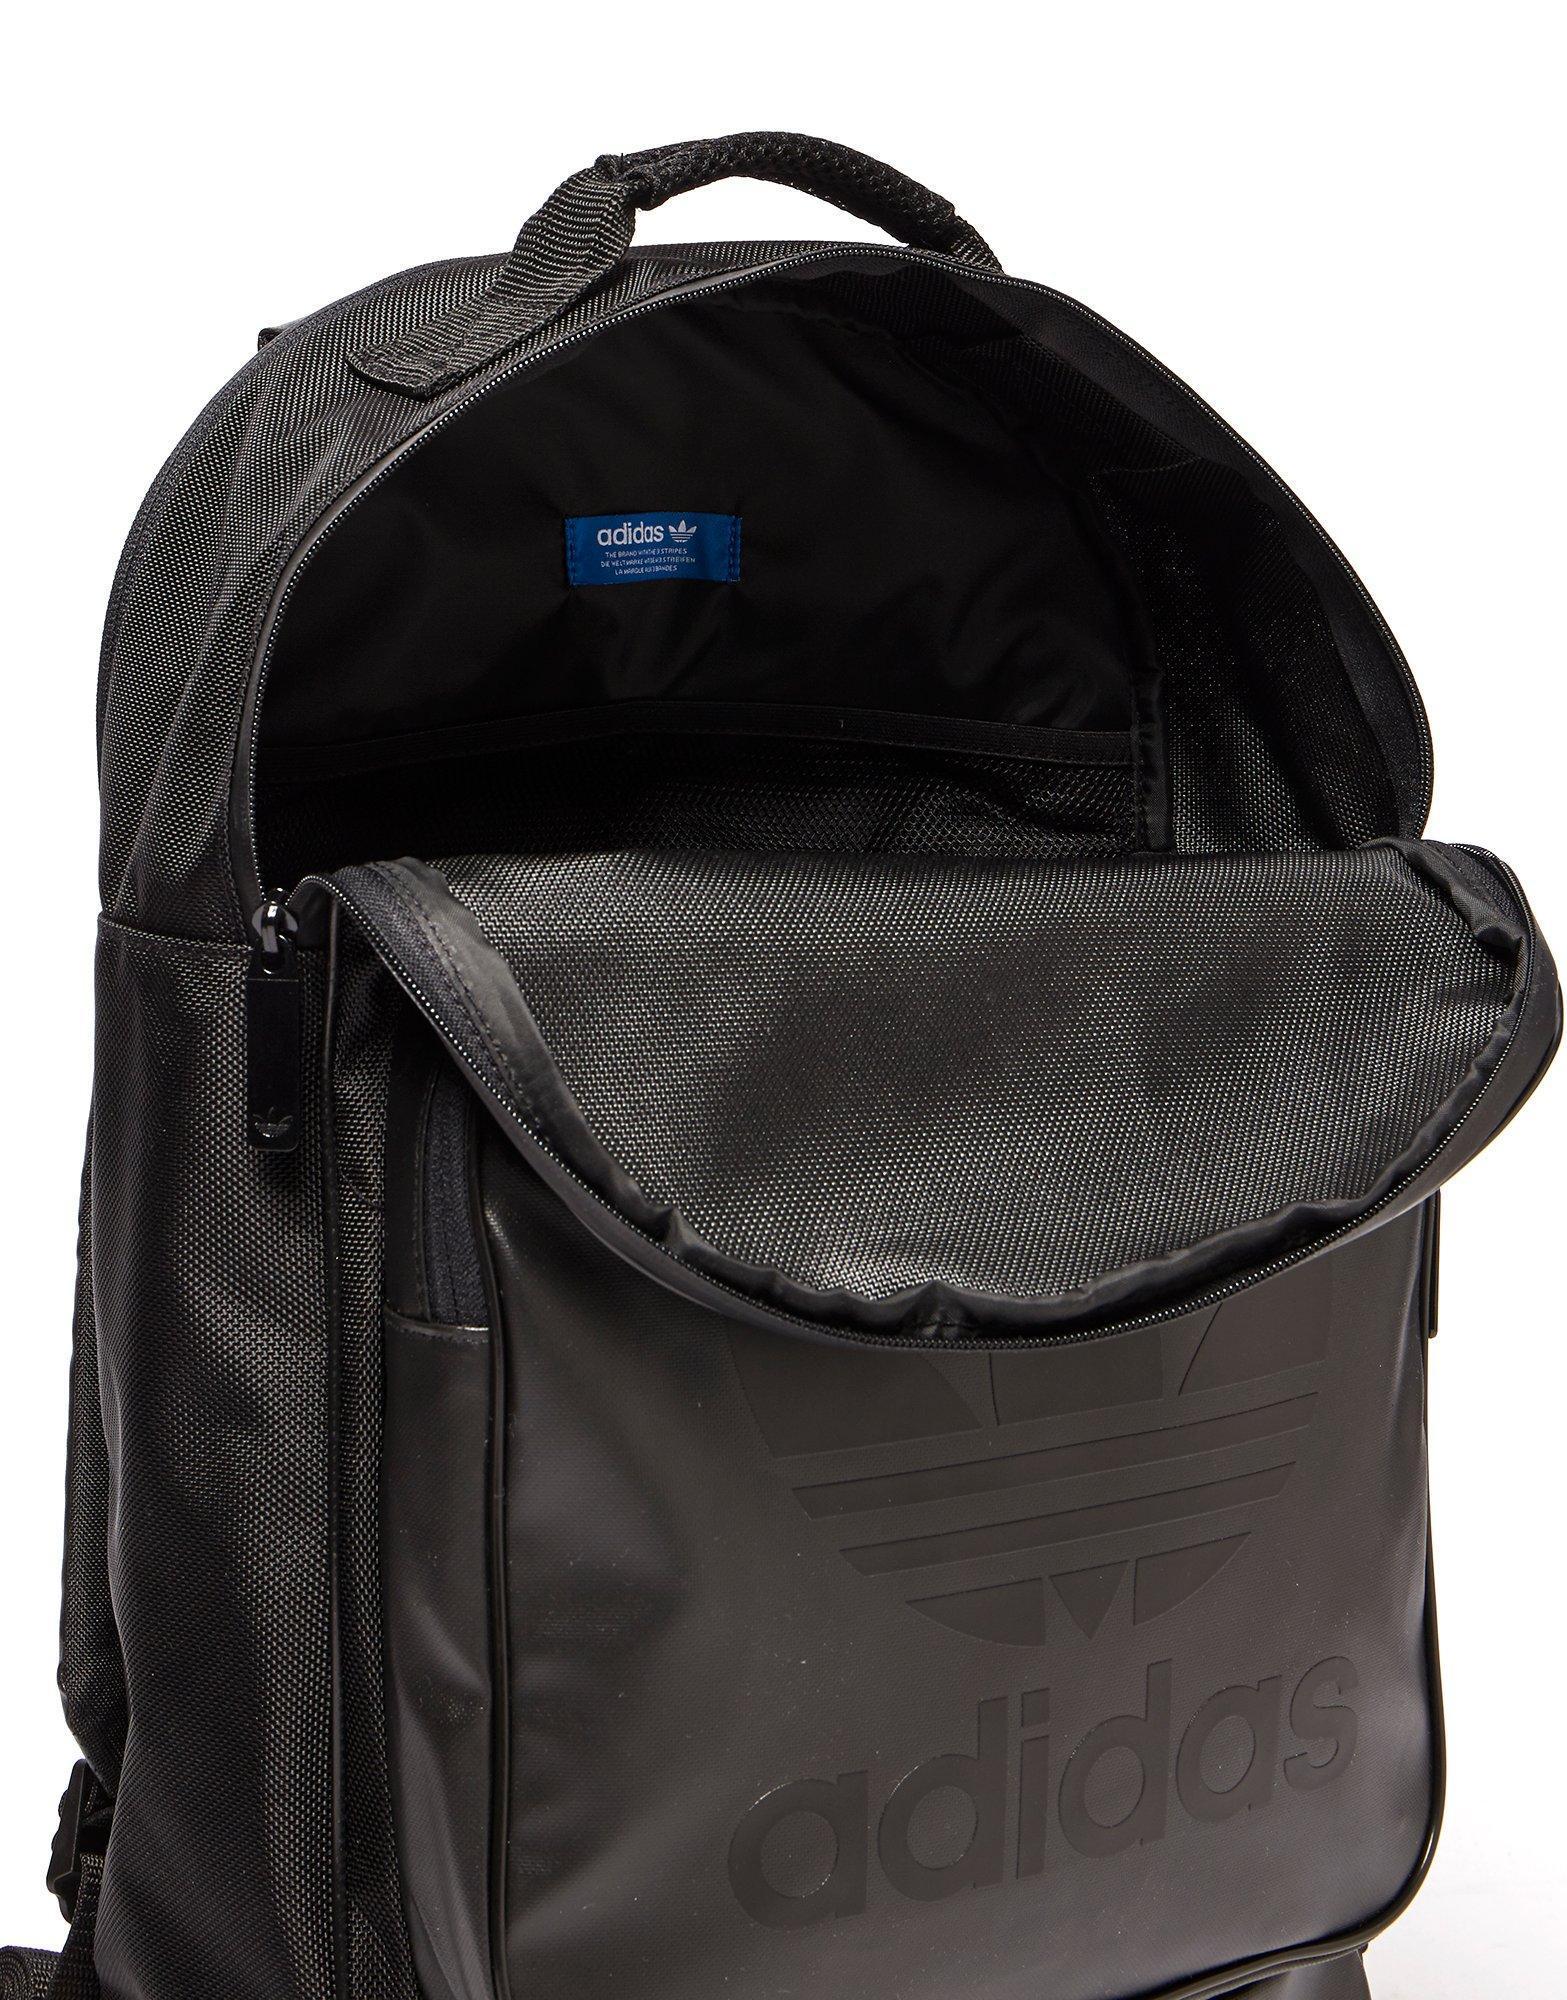 e80c49c9789 Lyst - adidas Originals Street Sport Backpack in Black for Men